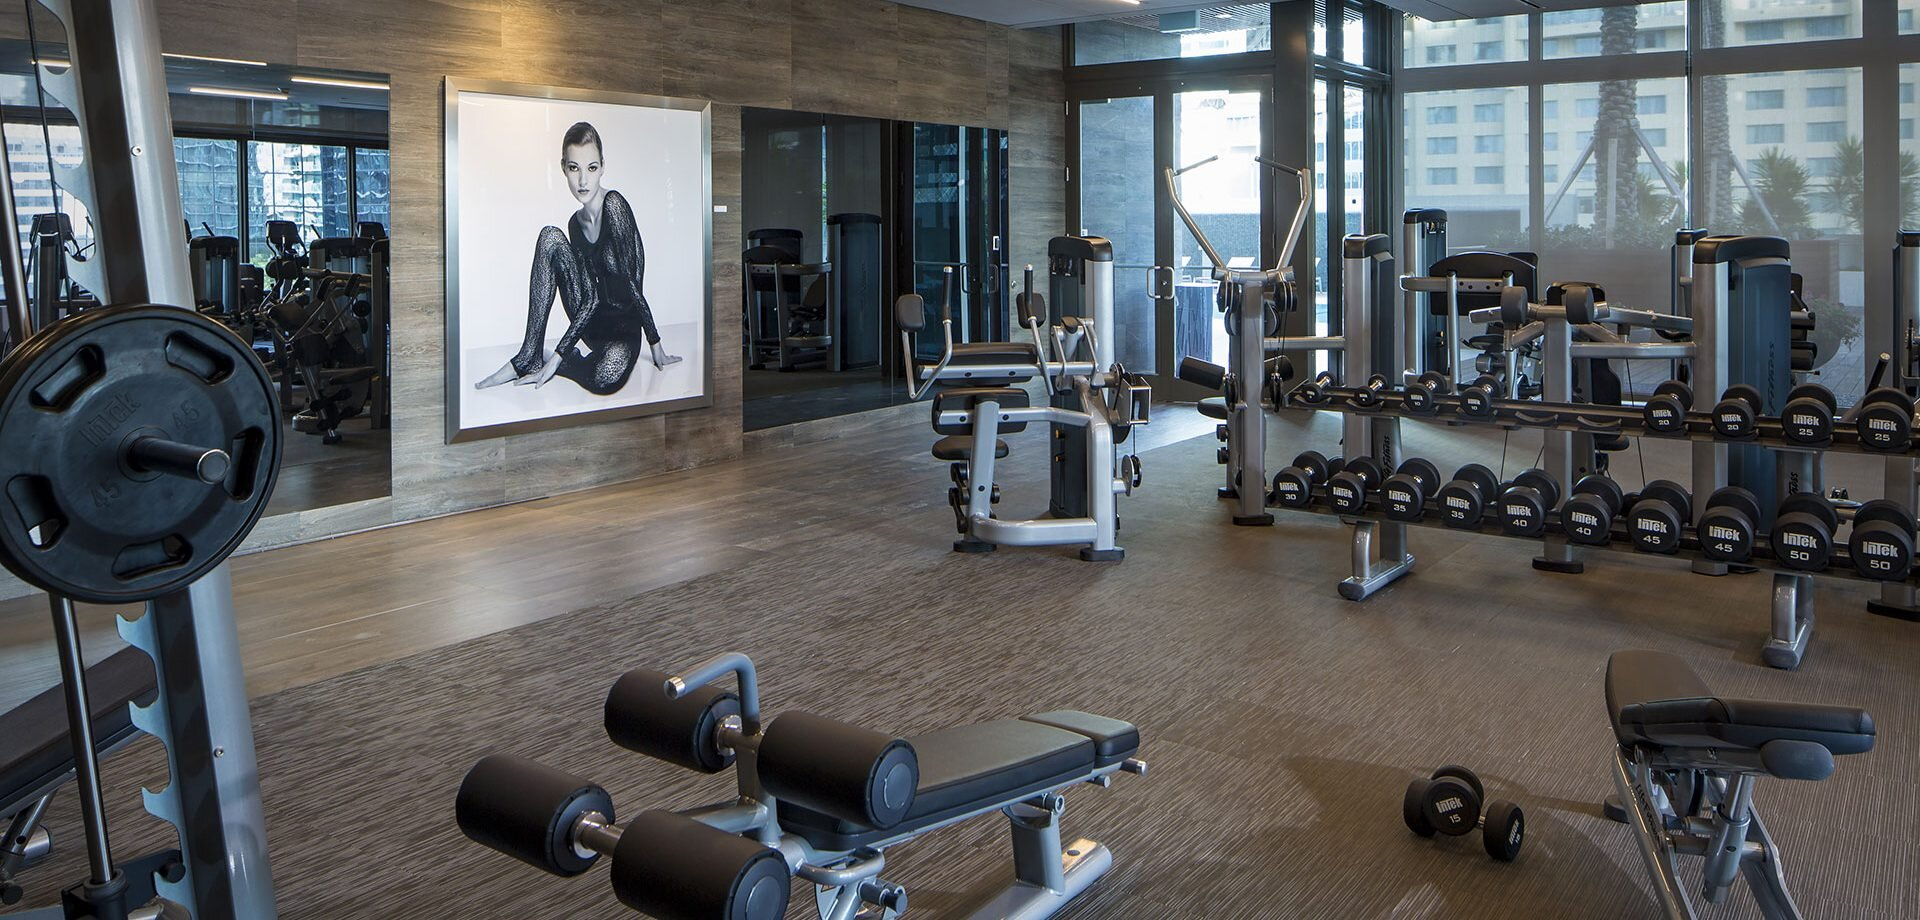 gym-the-bond-at-brickell_lipstickandchicspaces.com.jpg